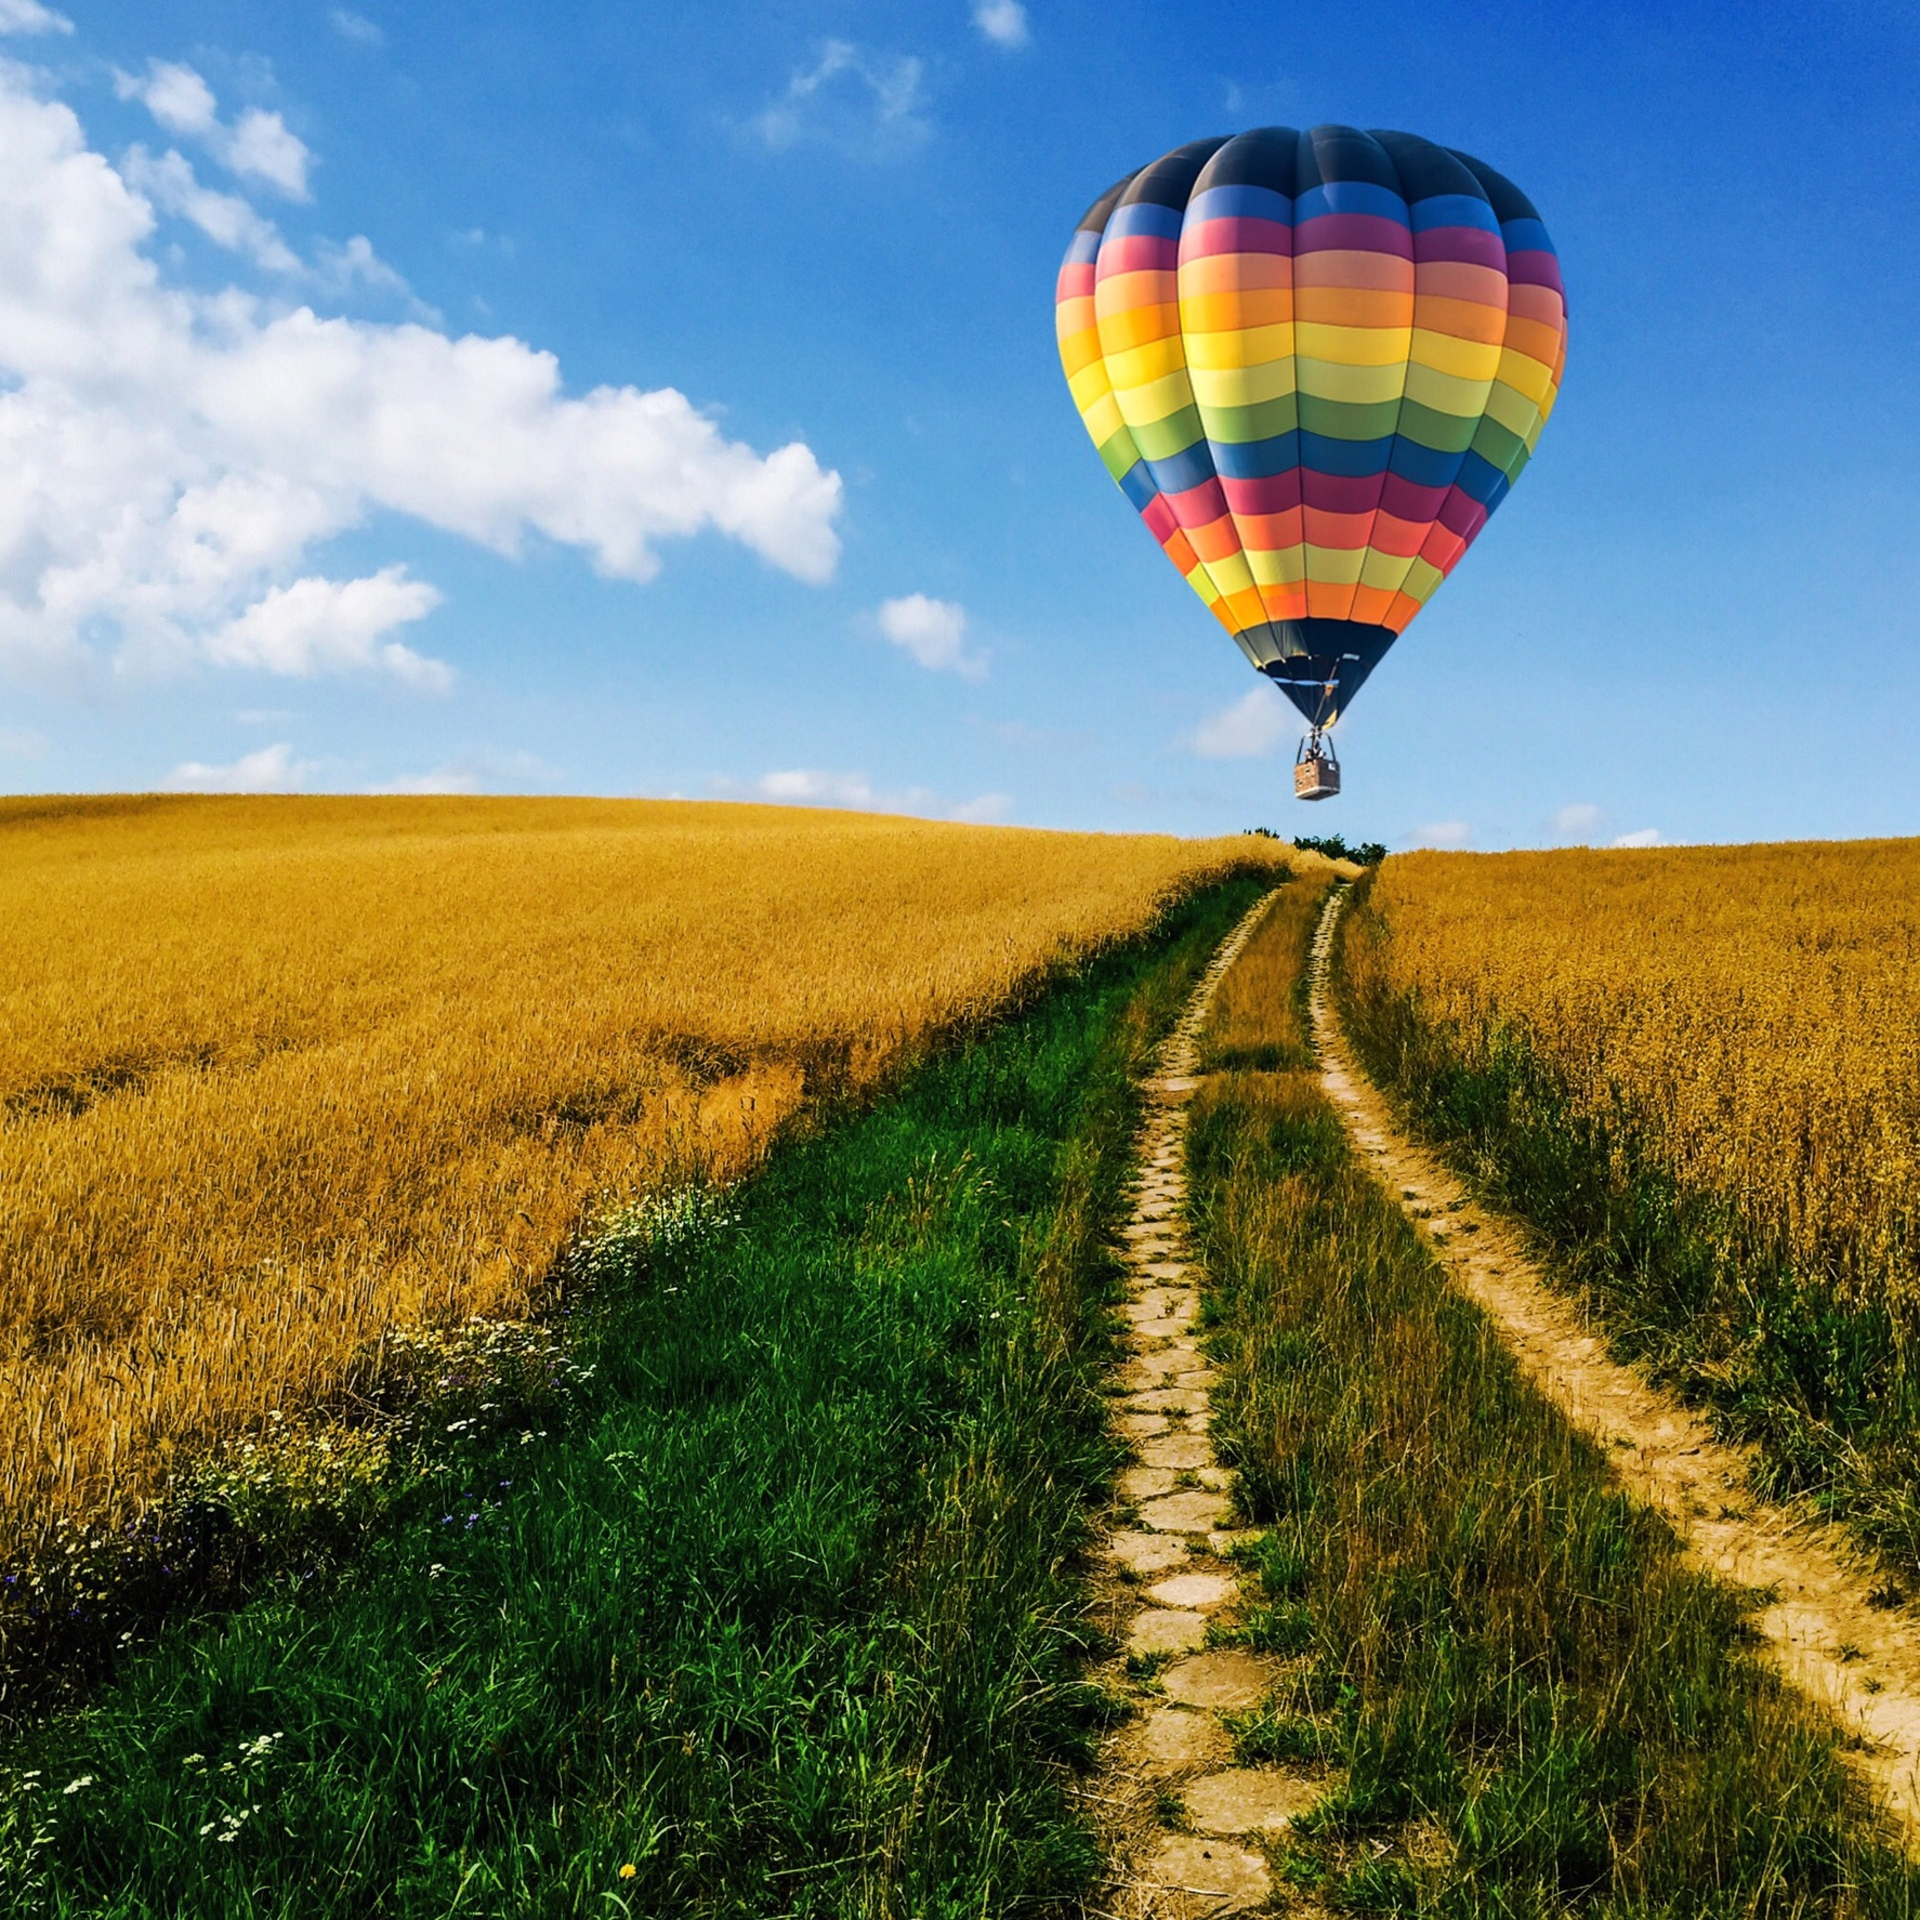 Hot air balloon over autumn field